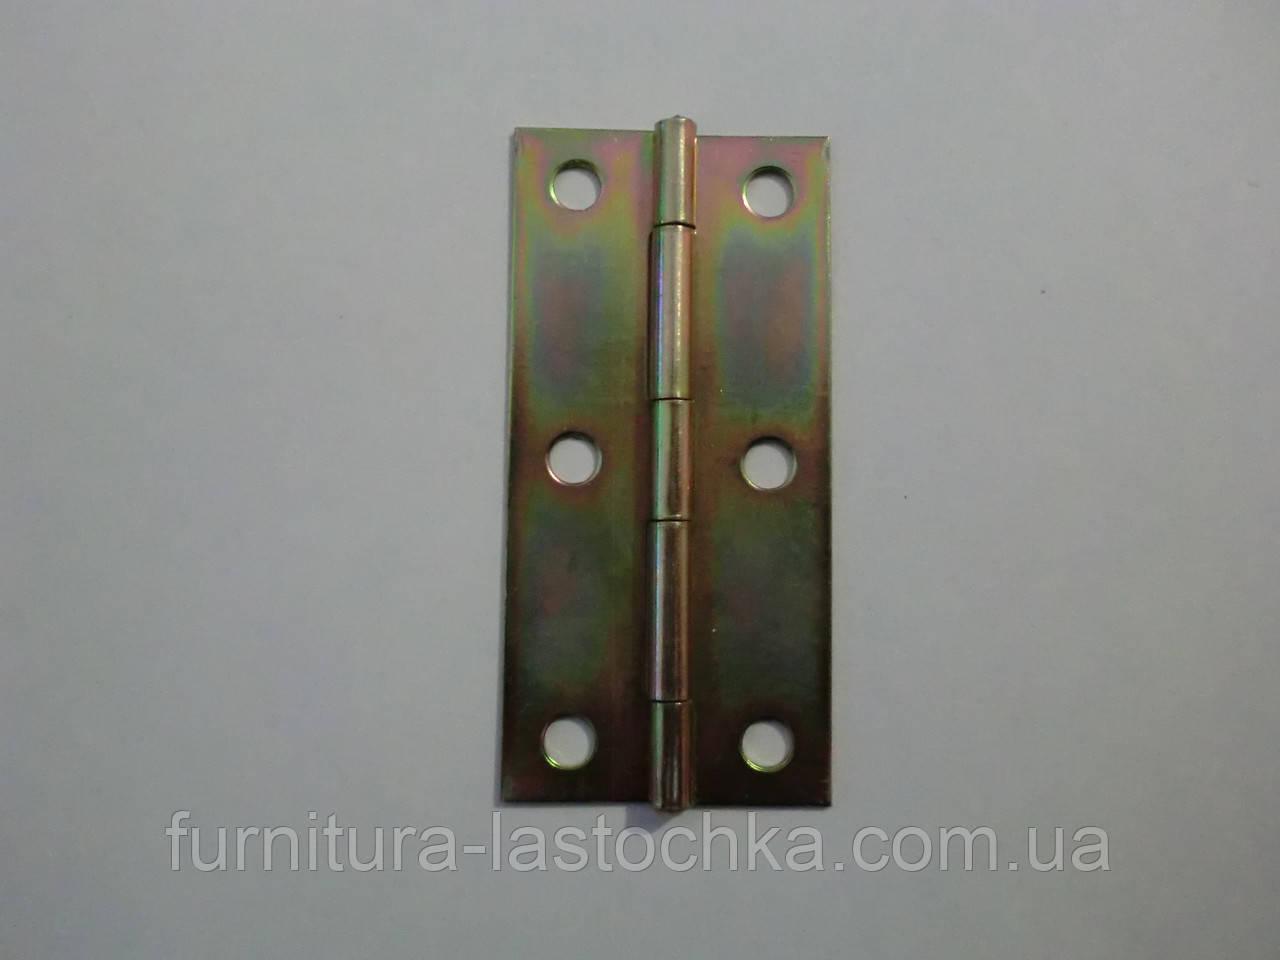 Петля форточная 73 мм, оцинкованная, узкая